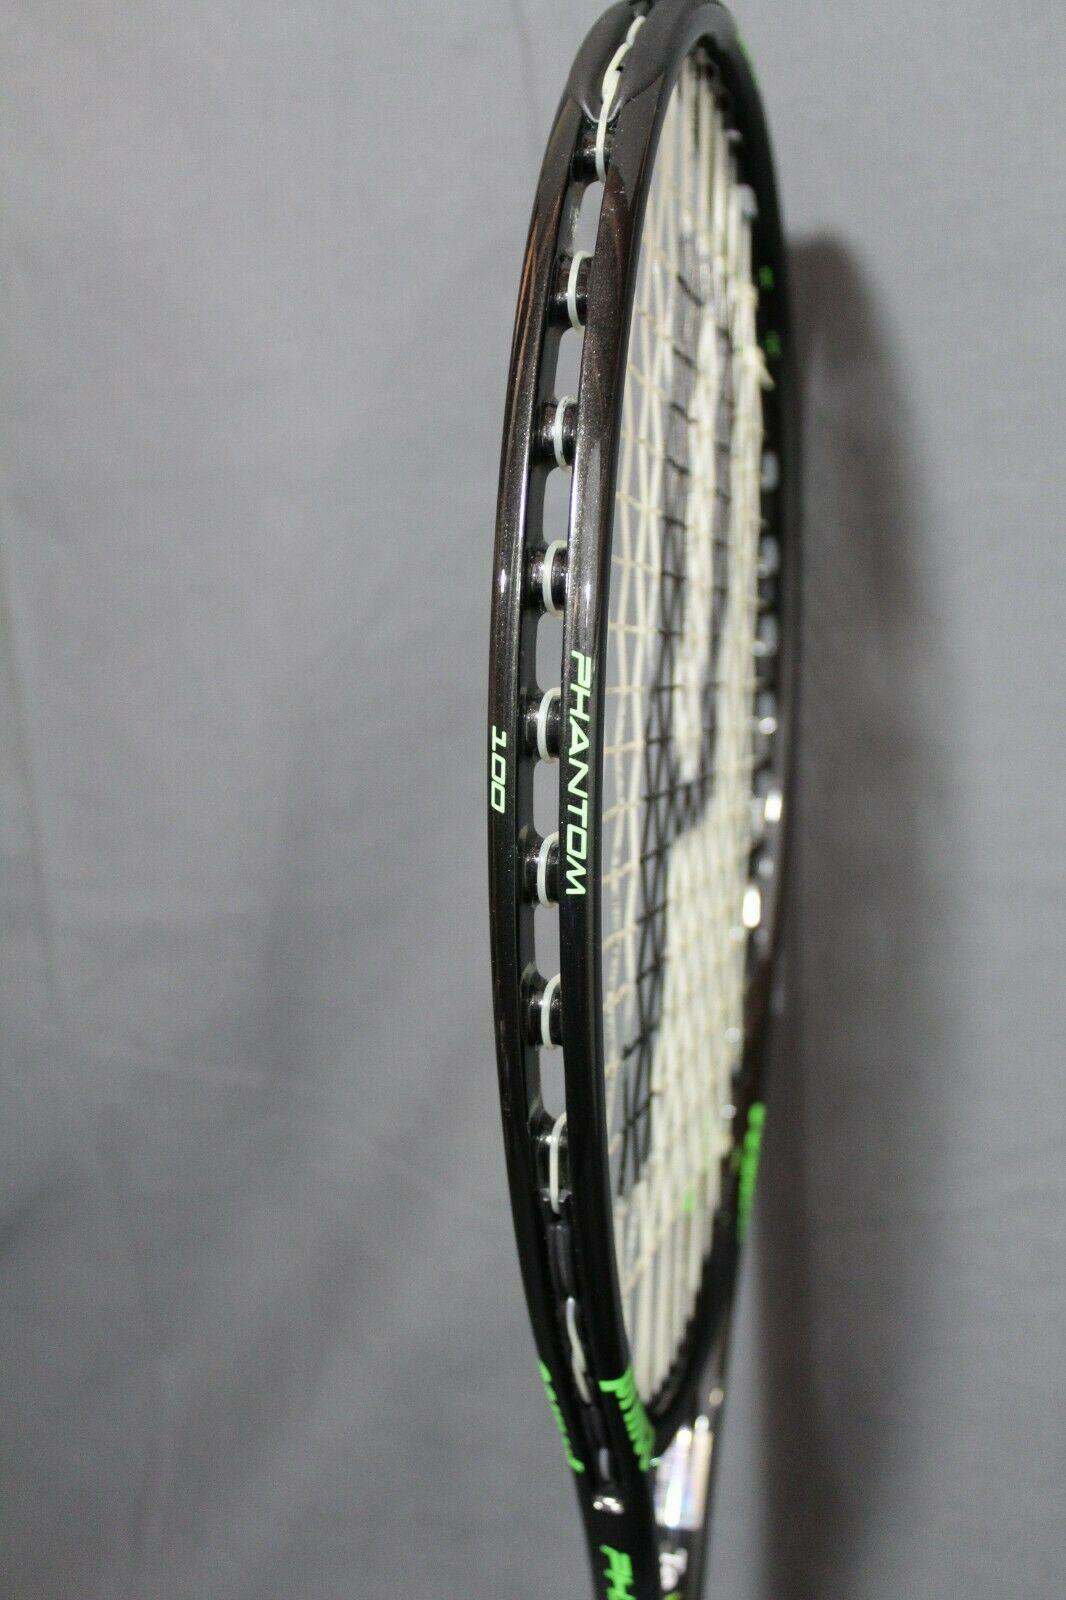 NEW Prince Textreme Phantom 100 Tennis Racquet 4 3/8 Strung